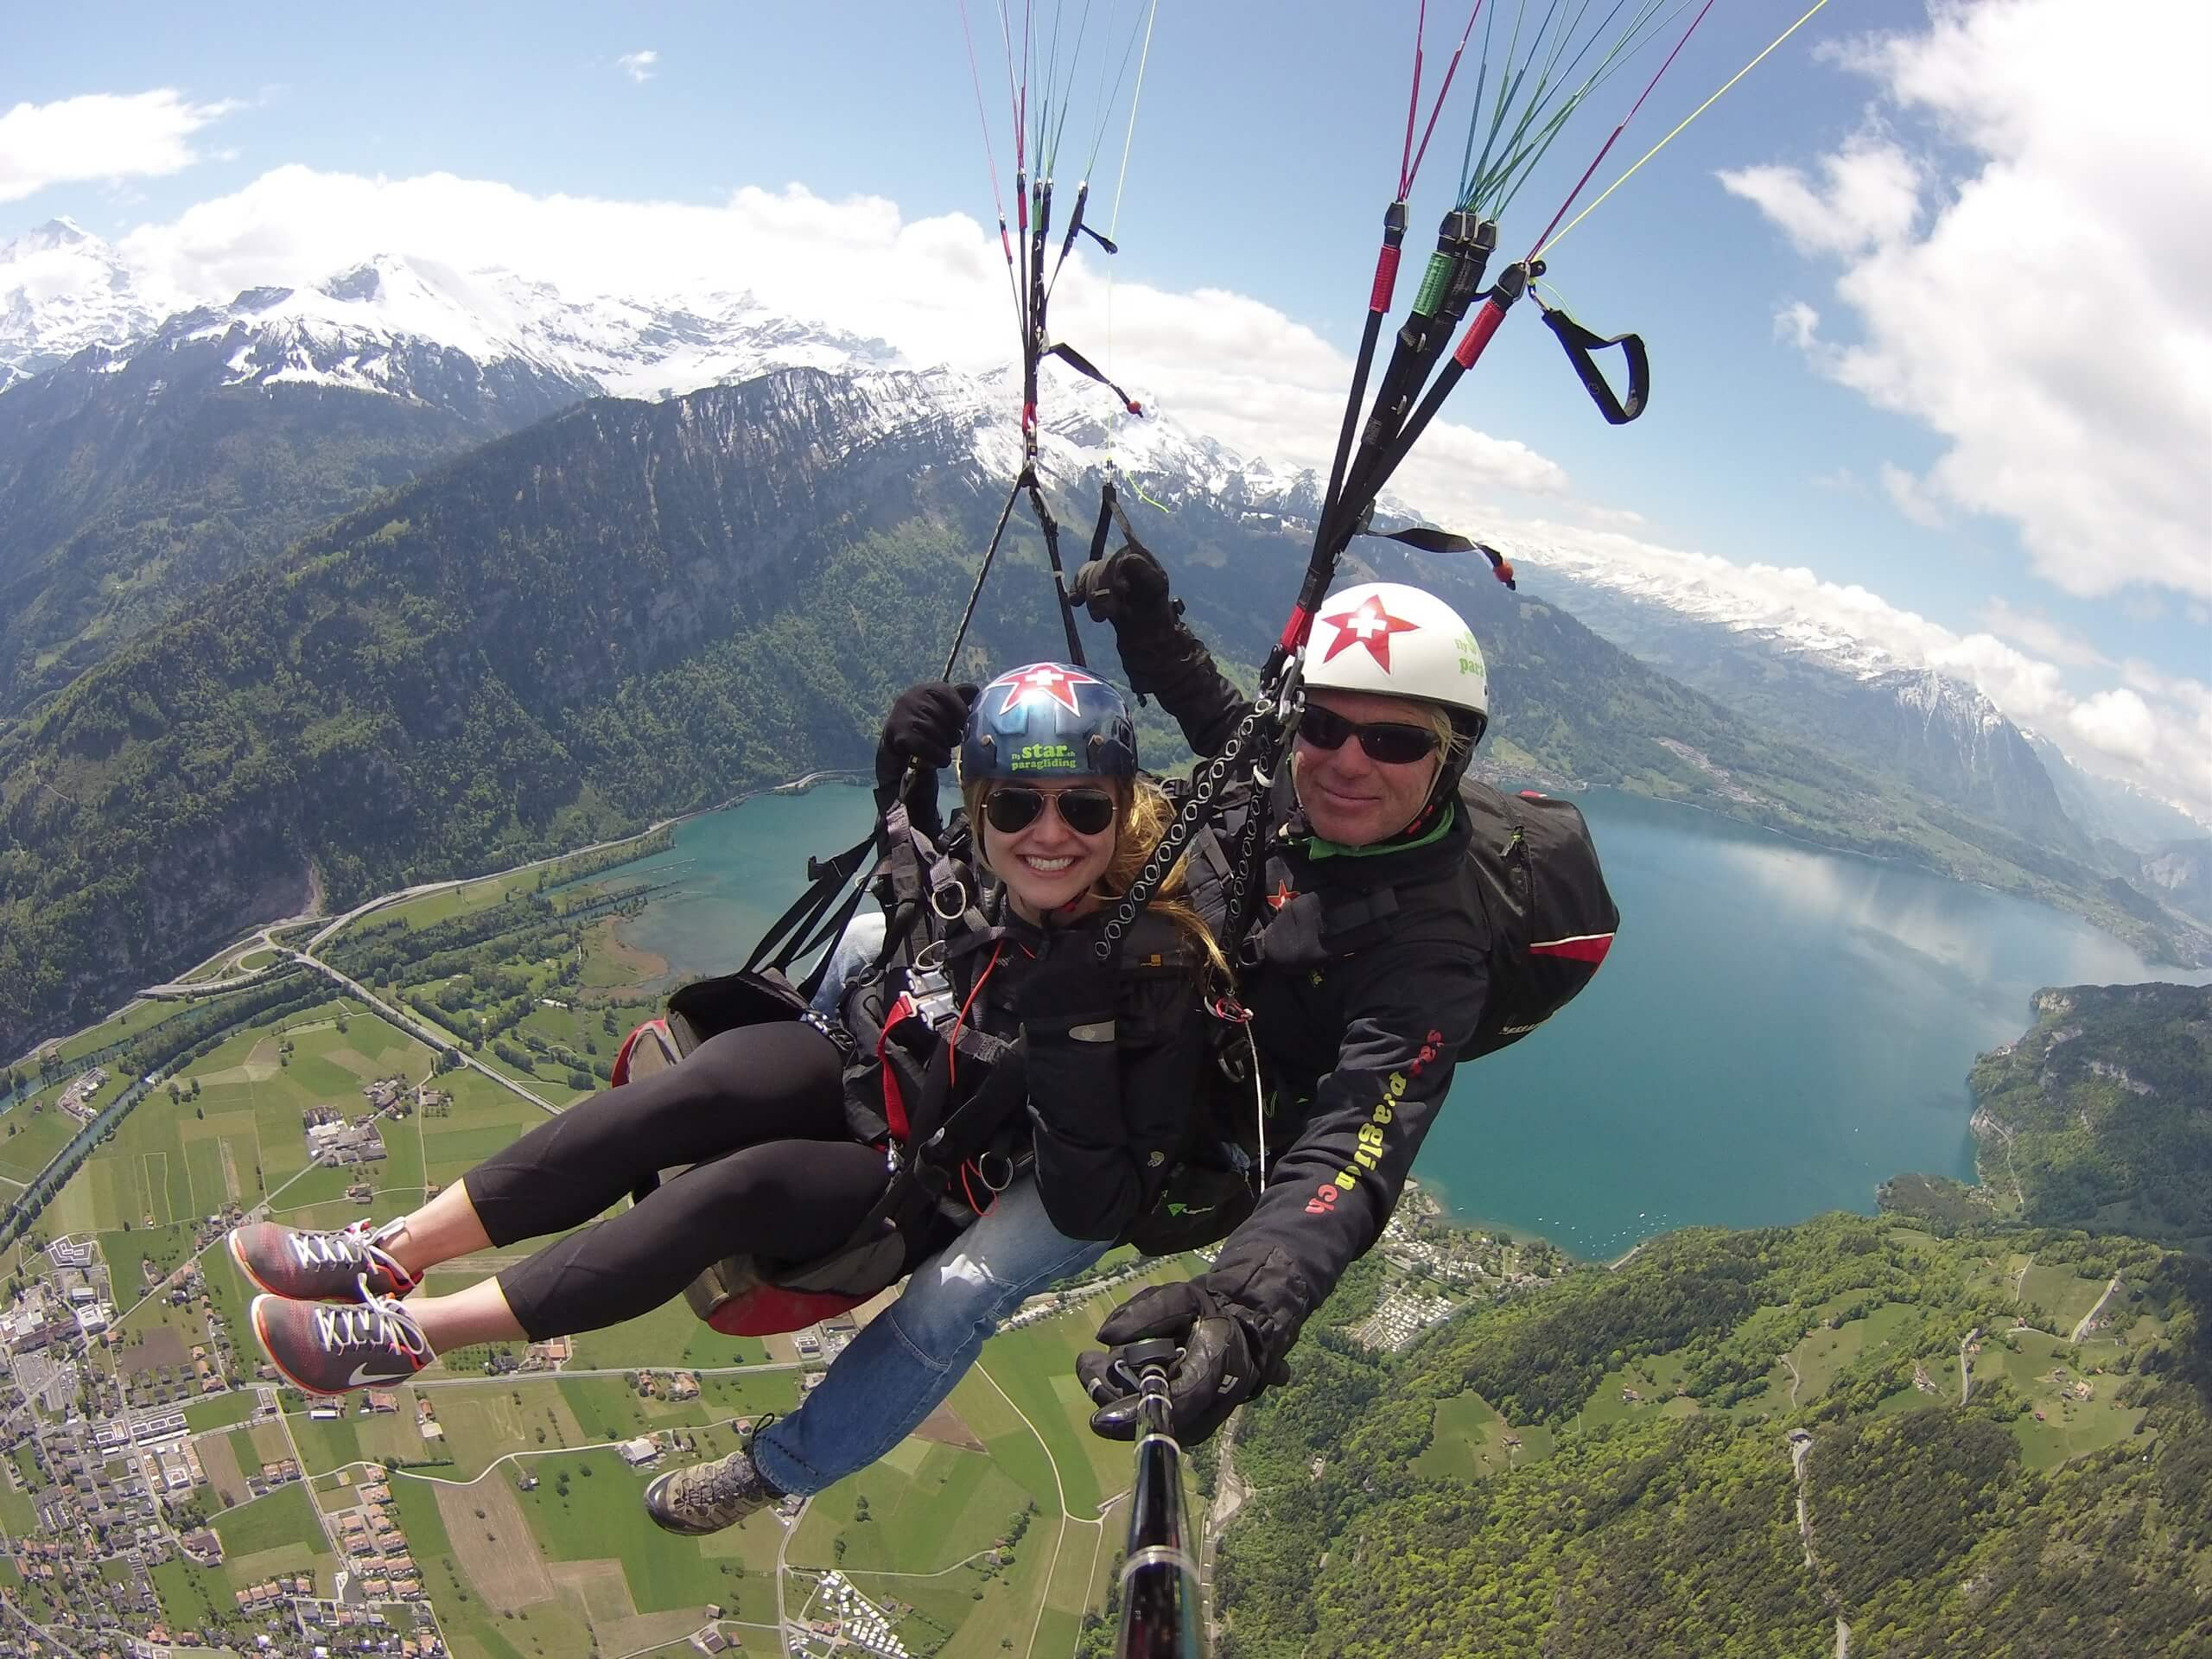 star-paragliding-thunersee-fruehling-panorama